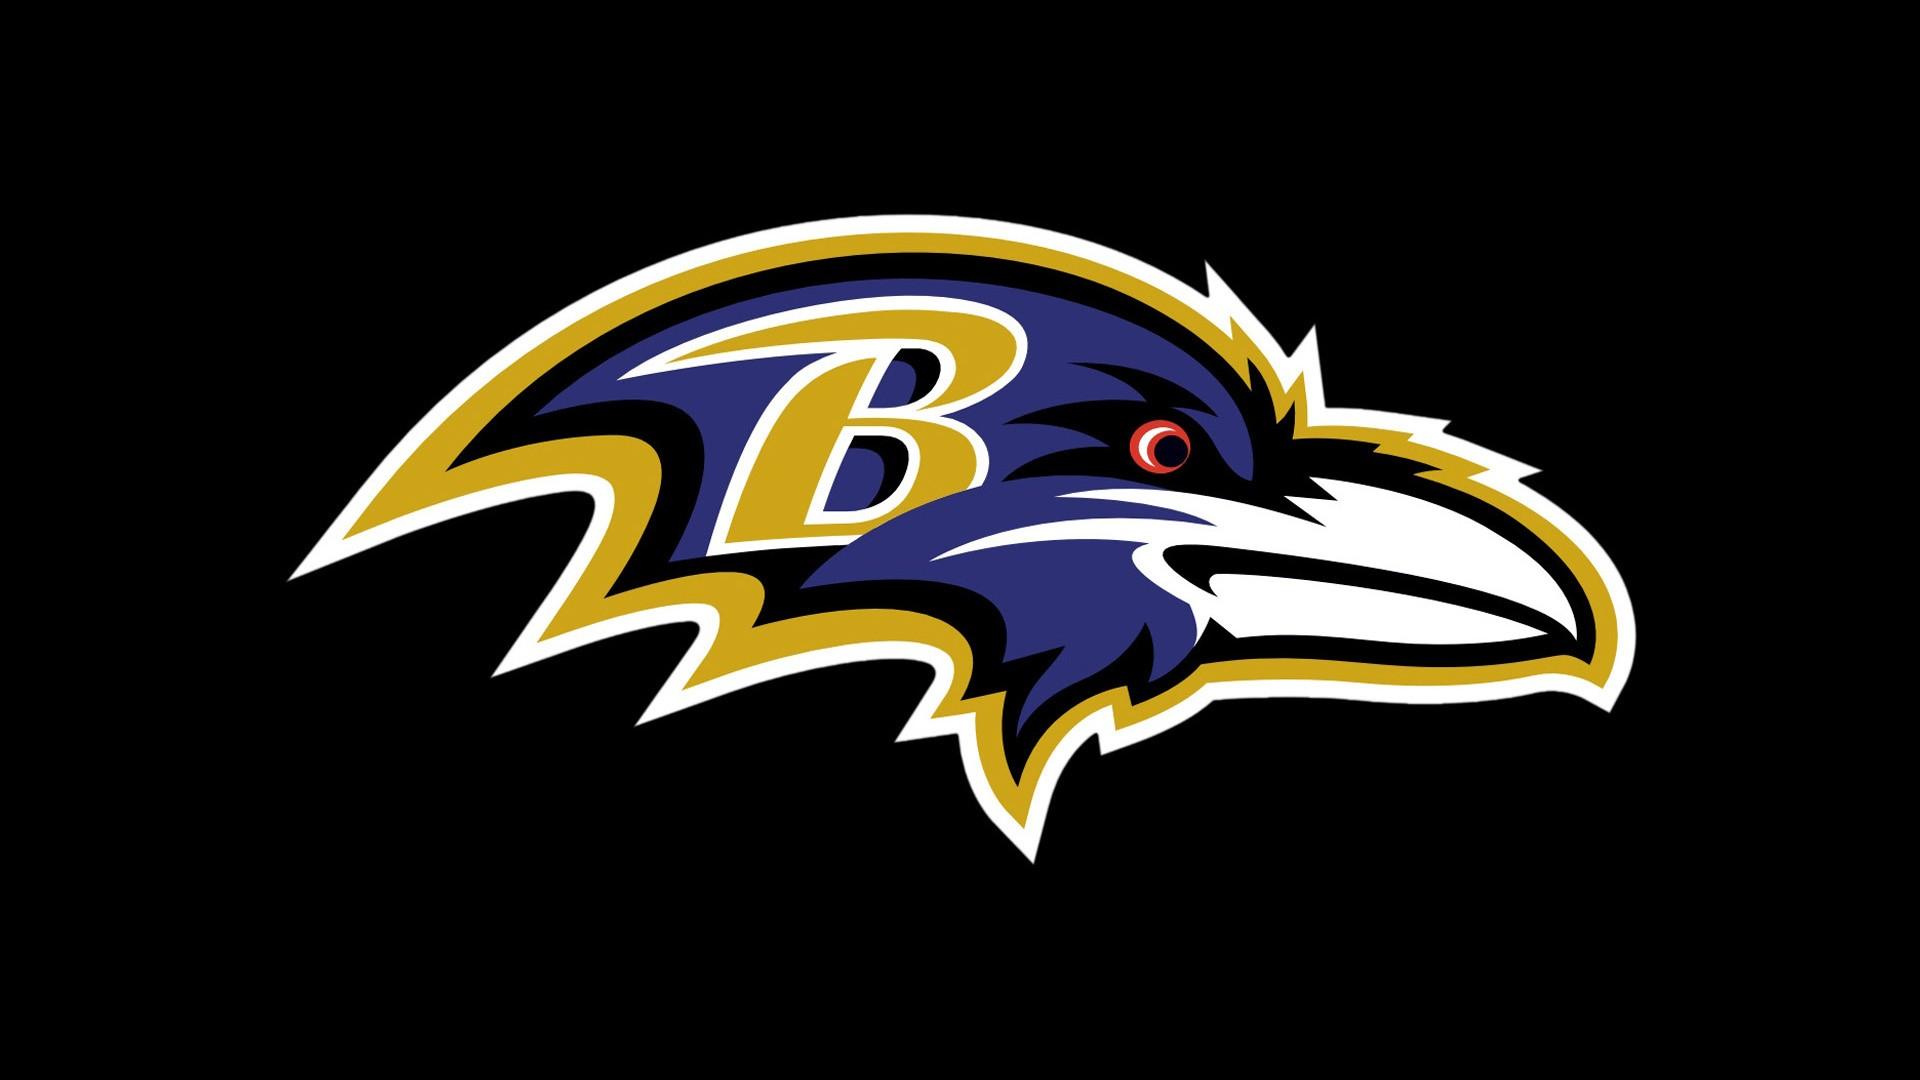 Ravens Football Logo HD Wallpaper Baltimore Ravens Football Logo 1920x1080